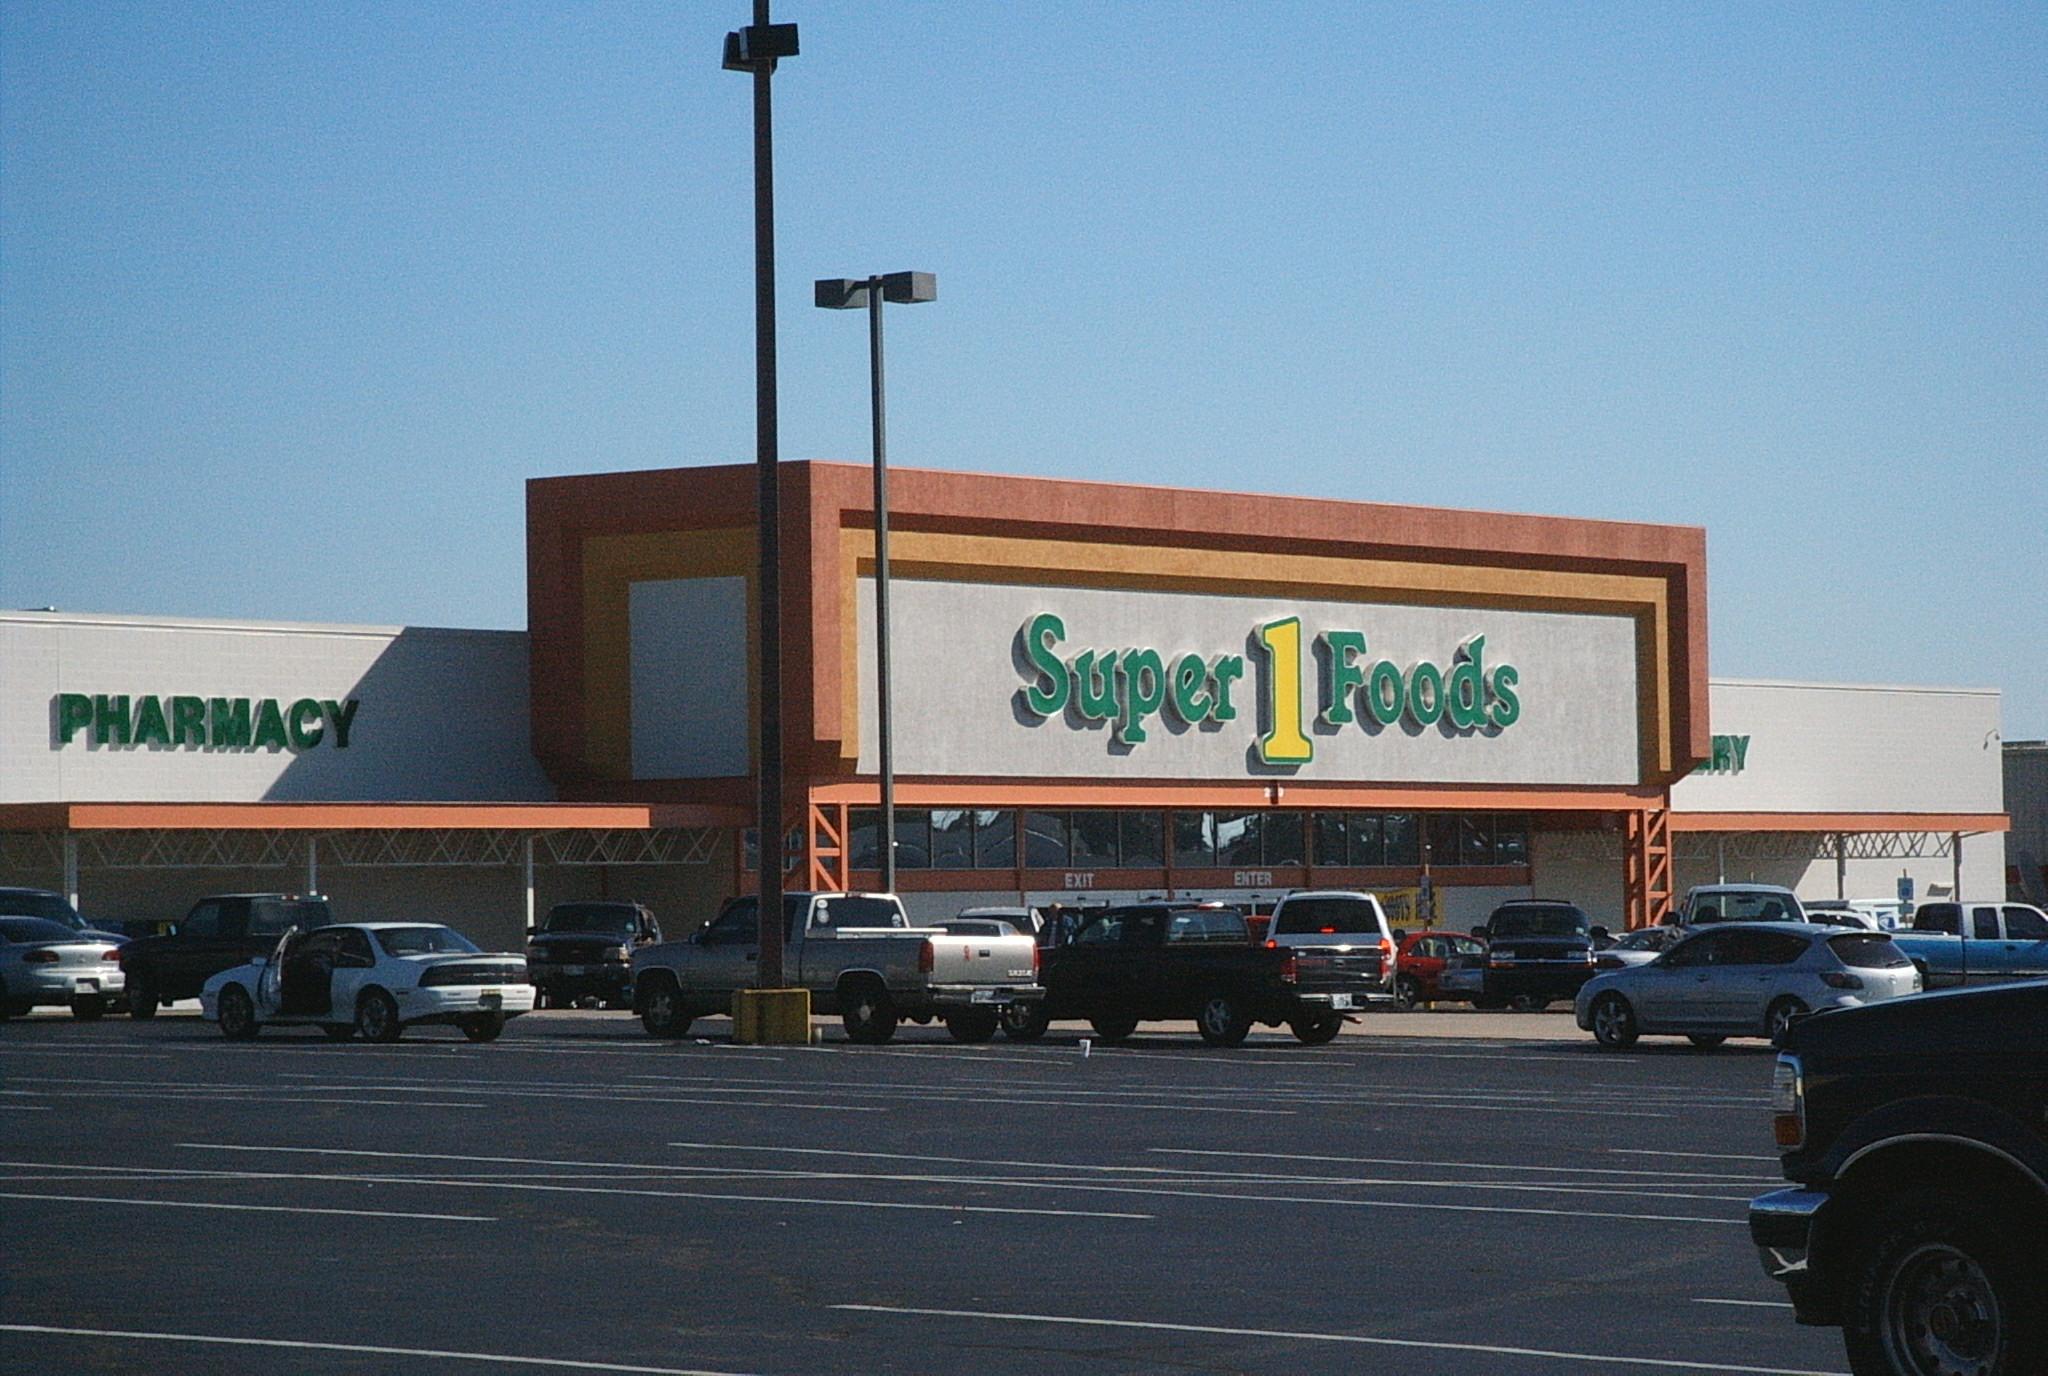 File:Super 1 Foods.jpg - Wikimedia Commons